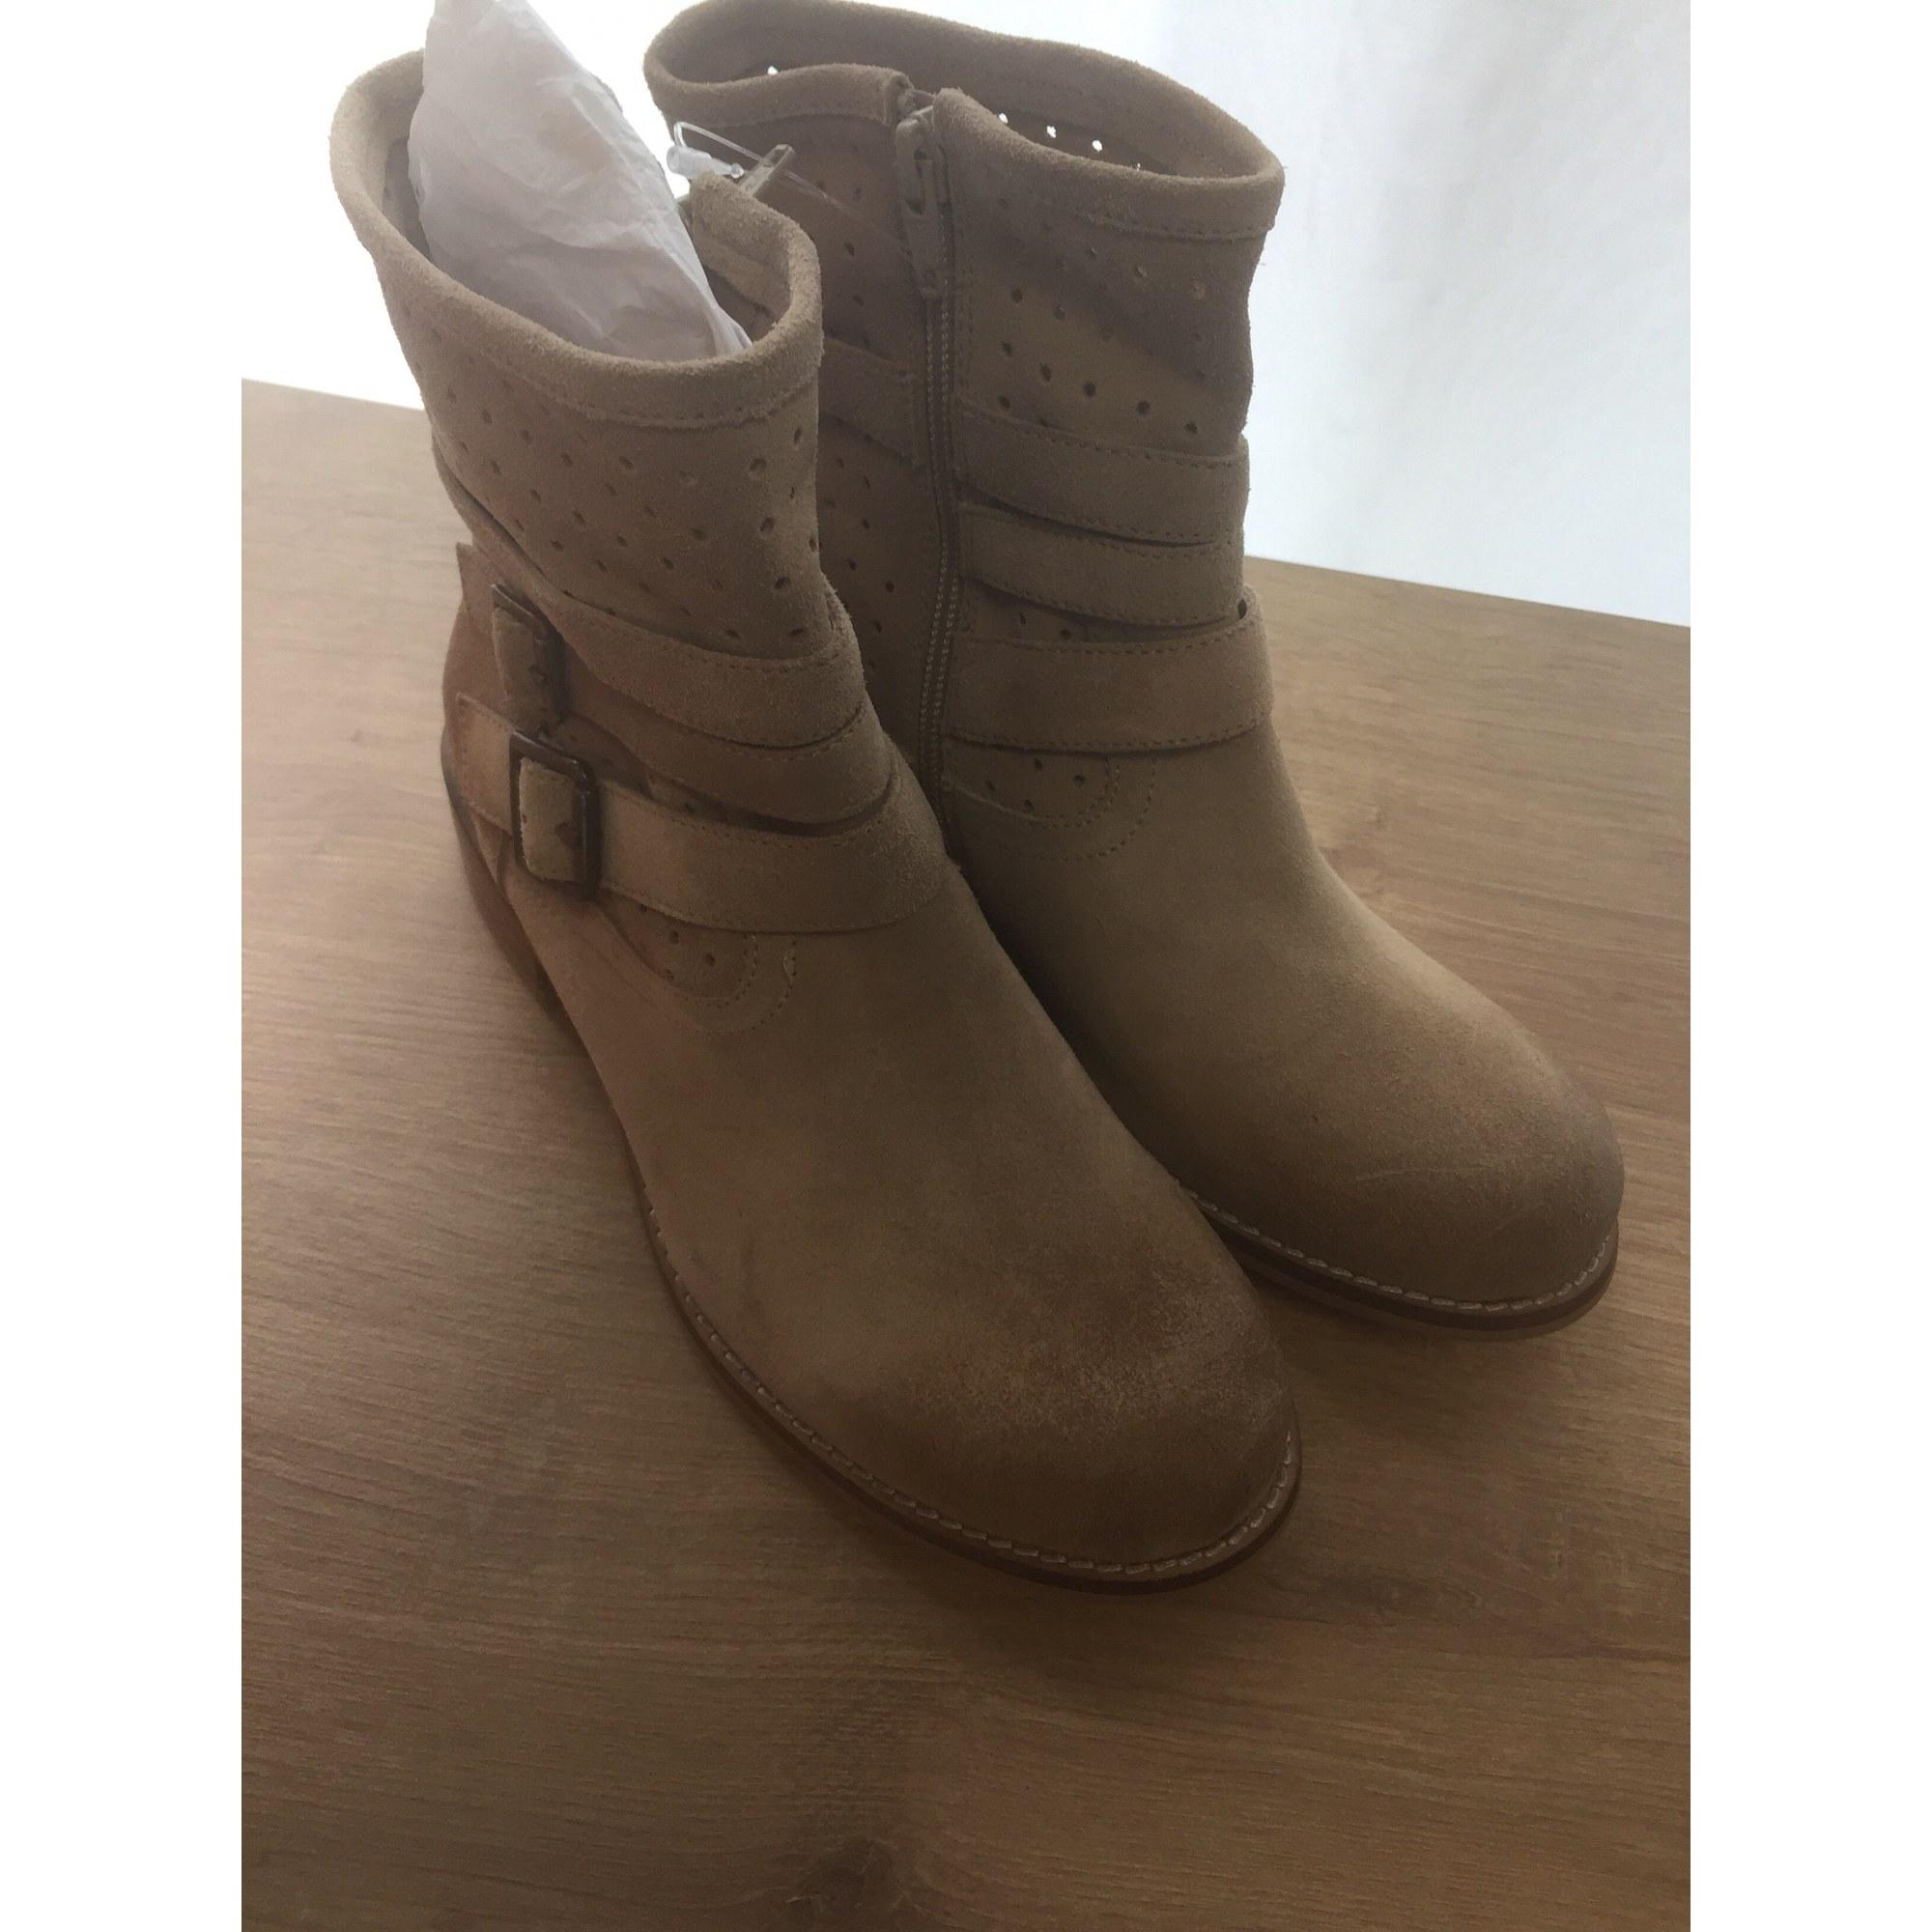 Bottines & low boots plates KICKERS Beige, camel